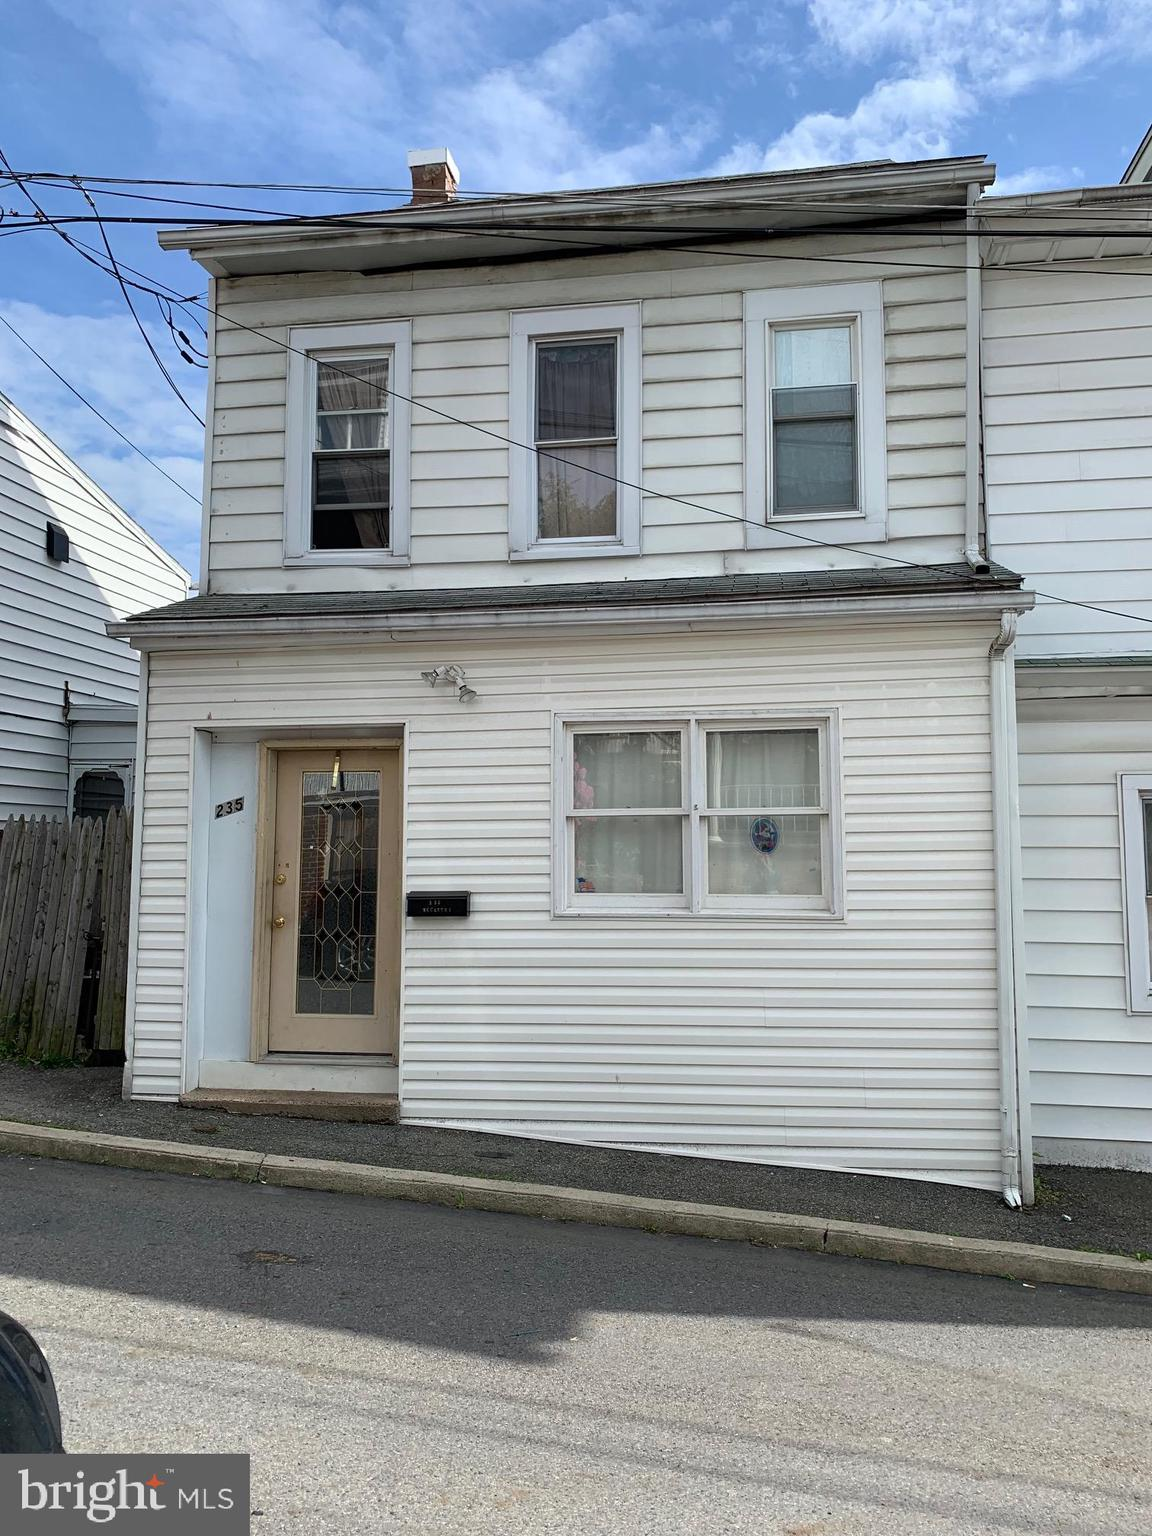 235 TWIN STREET, MINERSVILLE, PA 17954